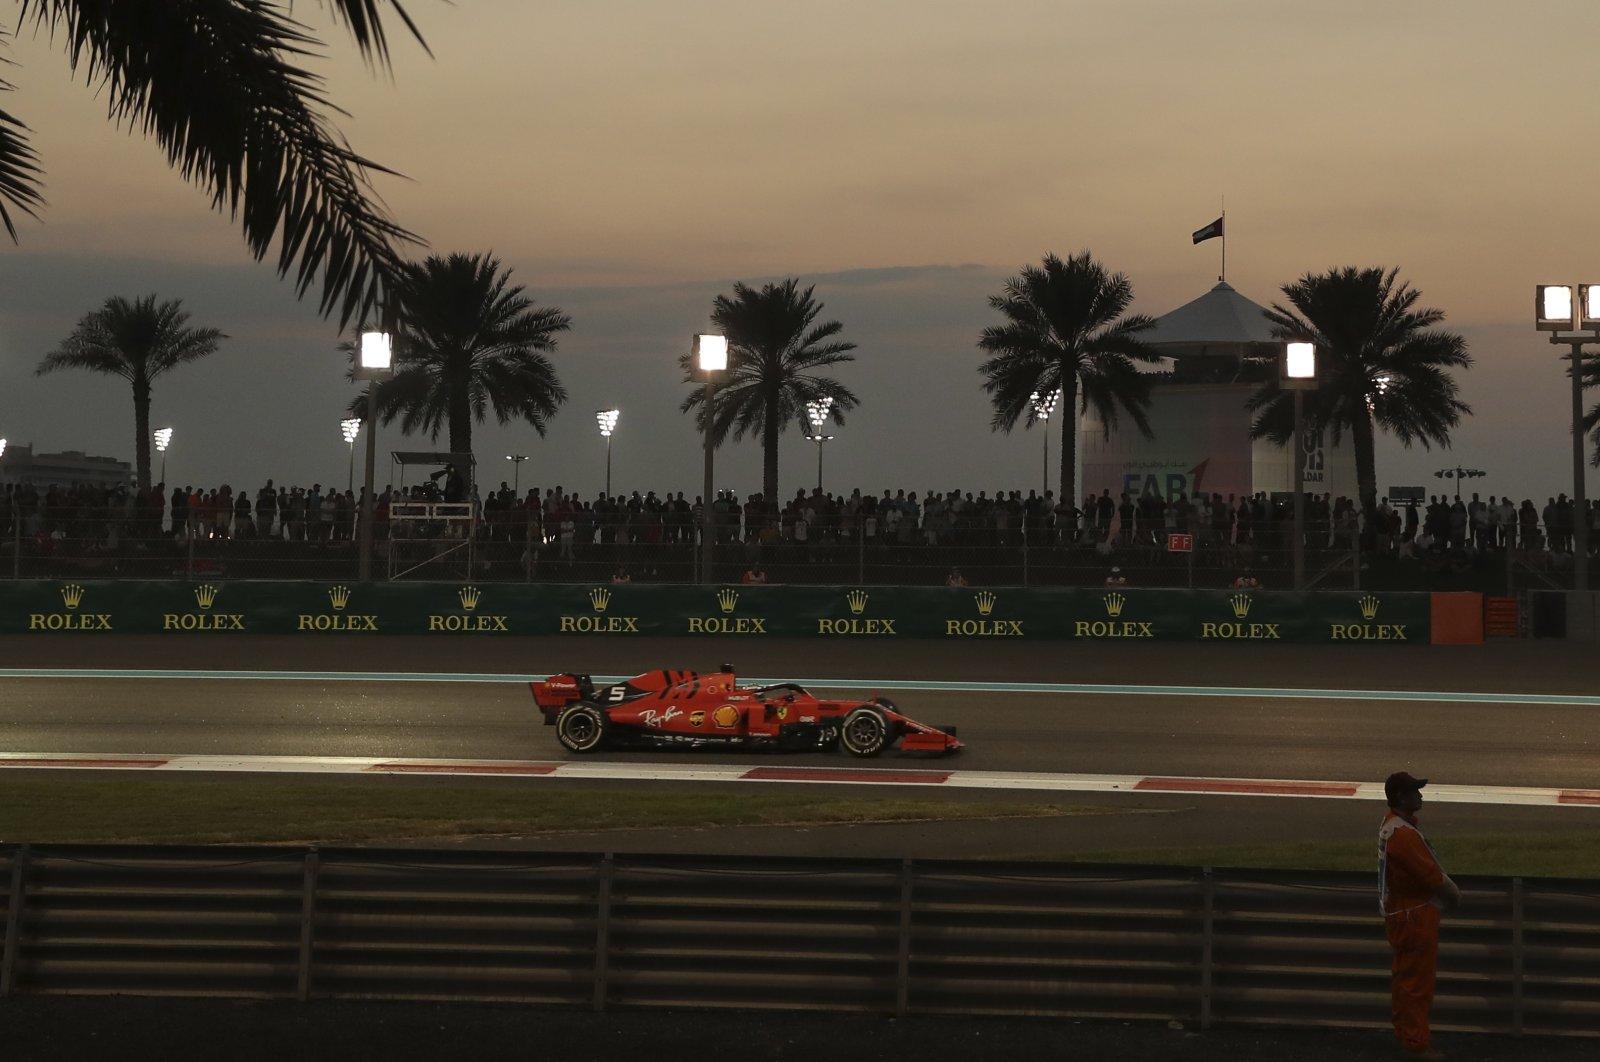 Ferrari driver Sebastian Vettel steers his car during the Formula One Abu Dhabi Grand Prix, at the Yas Marina racetrack in Abu Dhabi, UAE, Dec.1, 2019. (AP Photo)